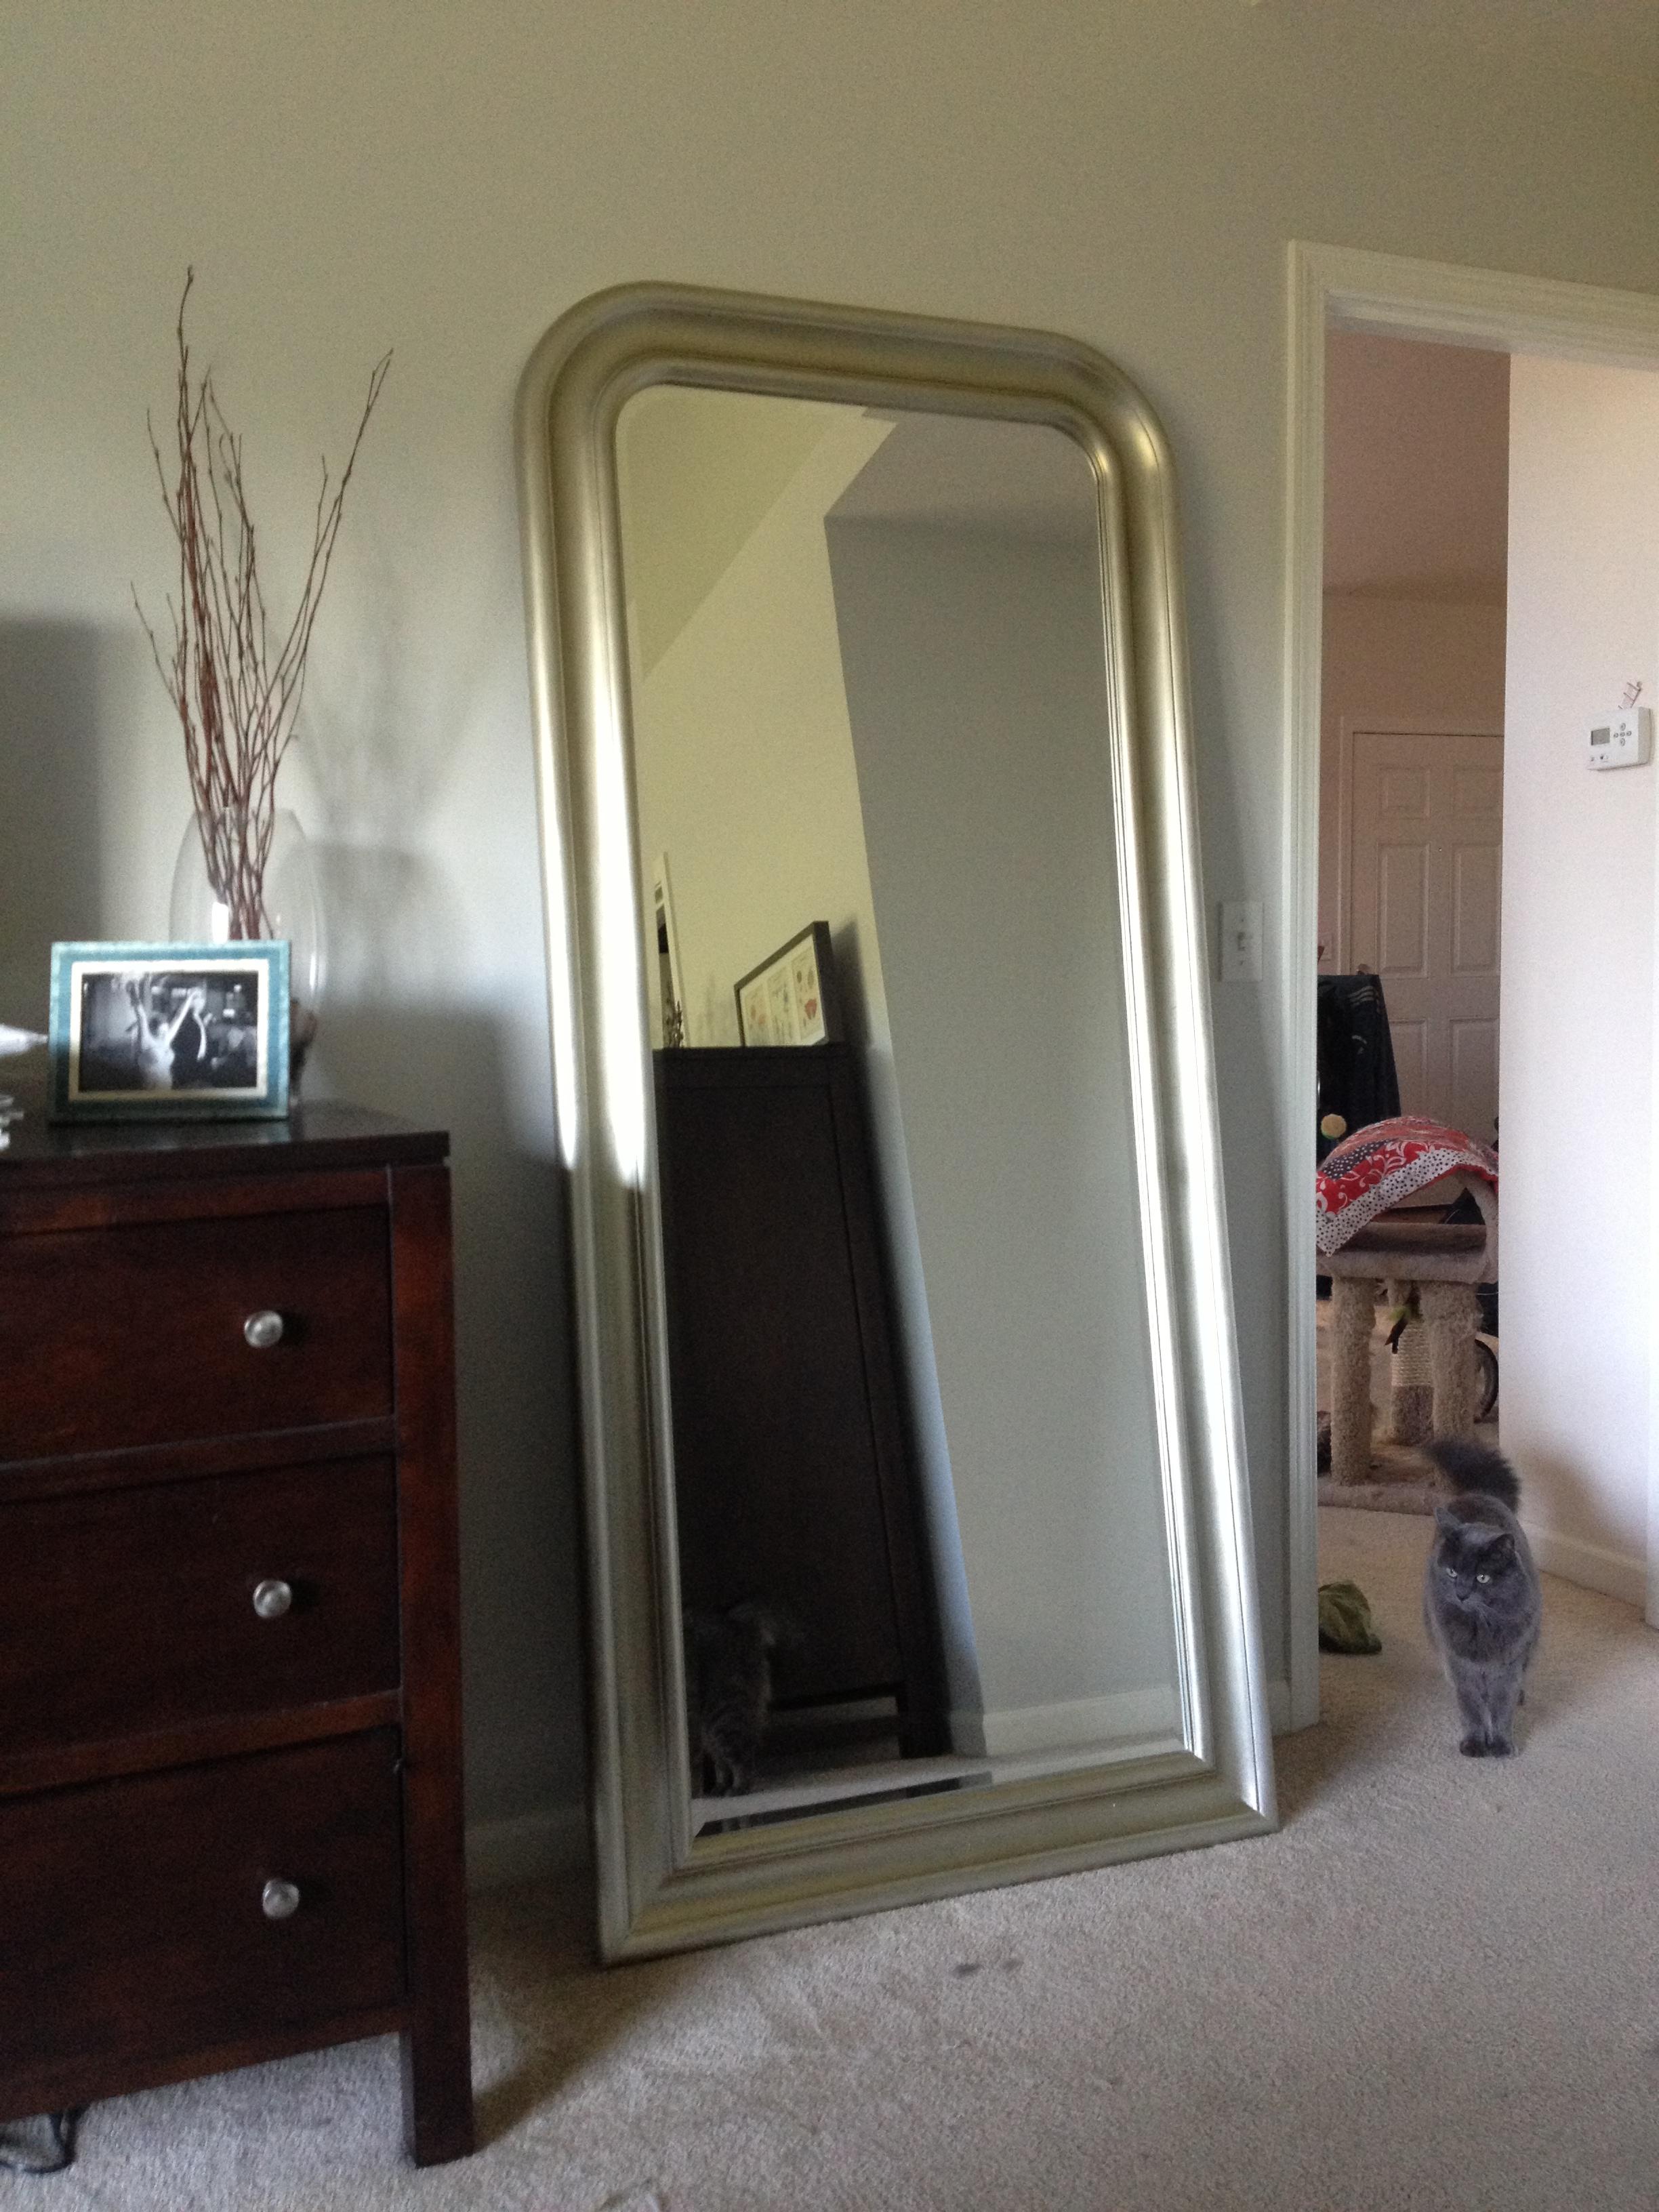 IKEA Songe Mirror Inspired Domesticity